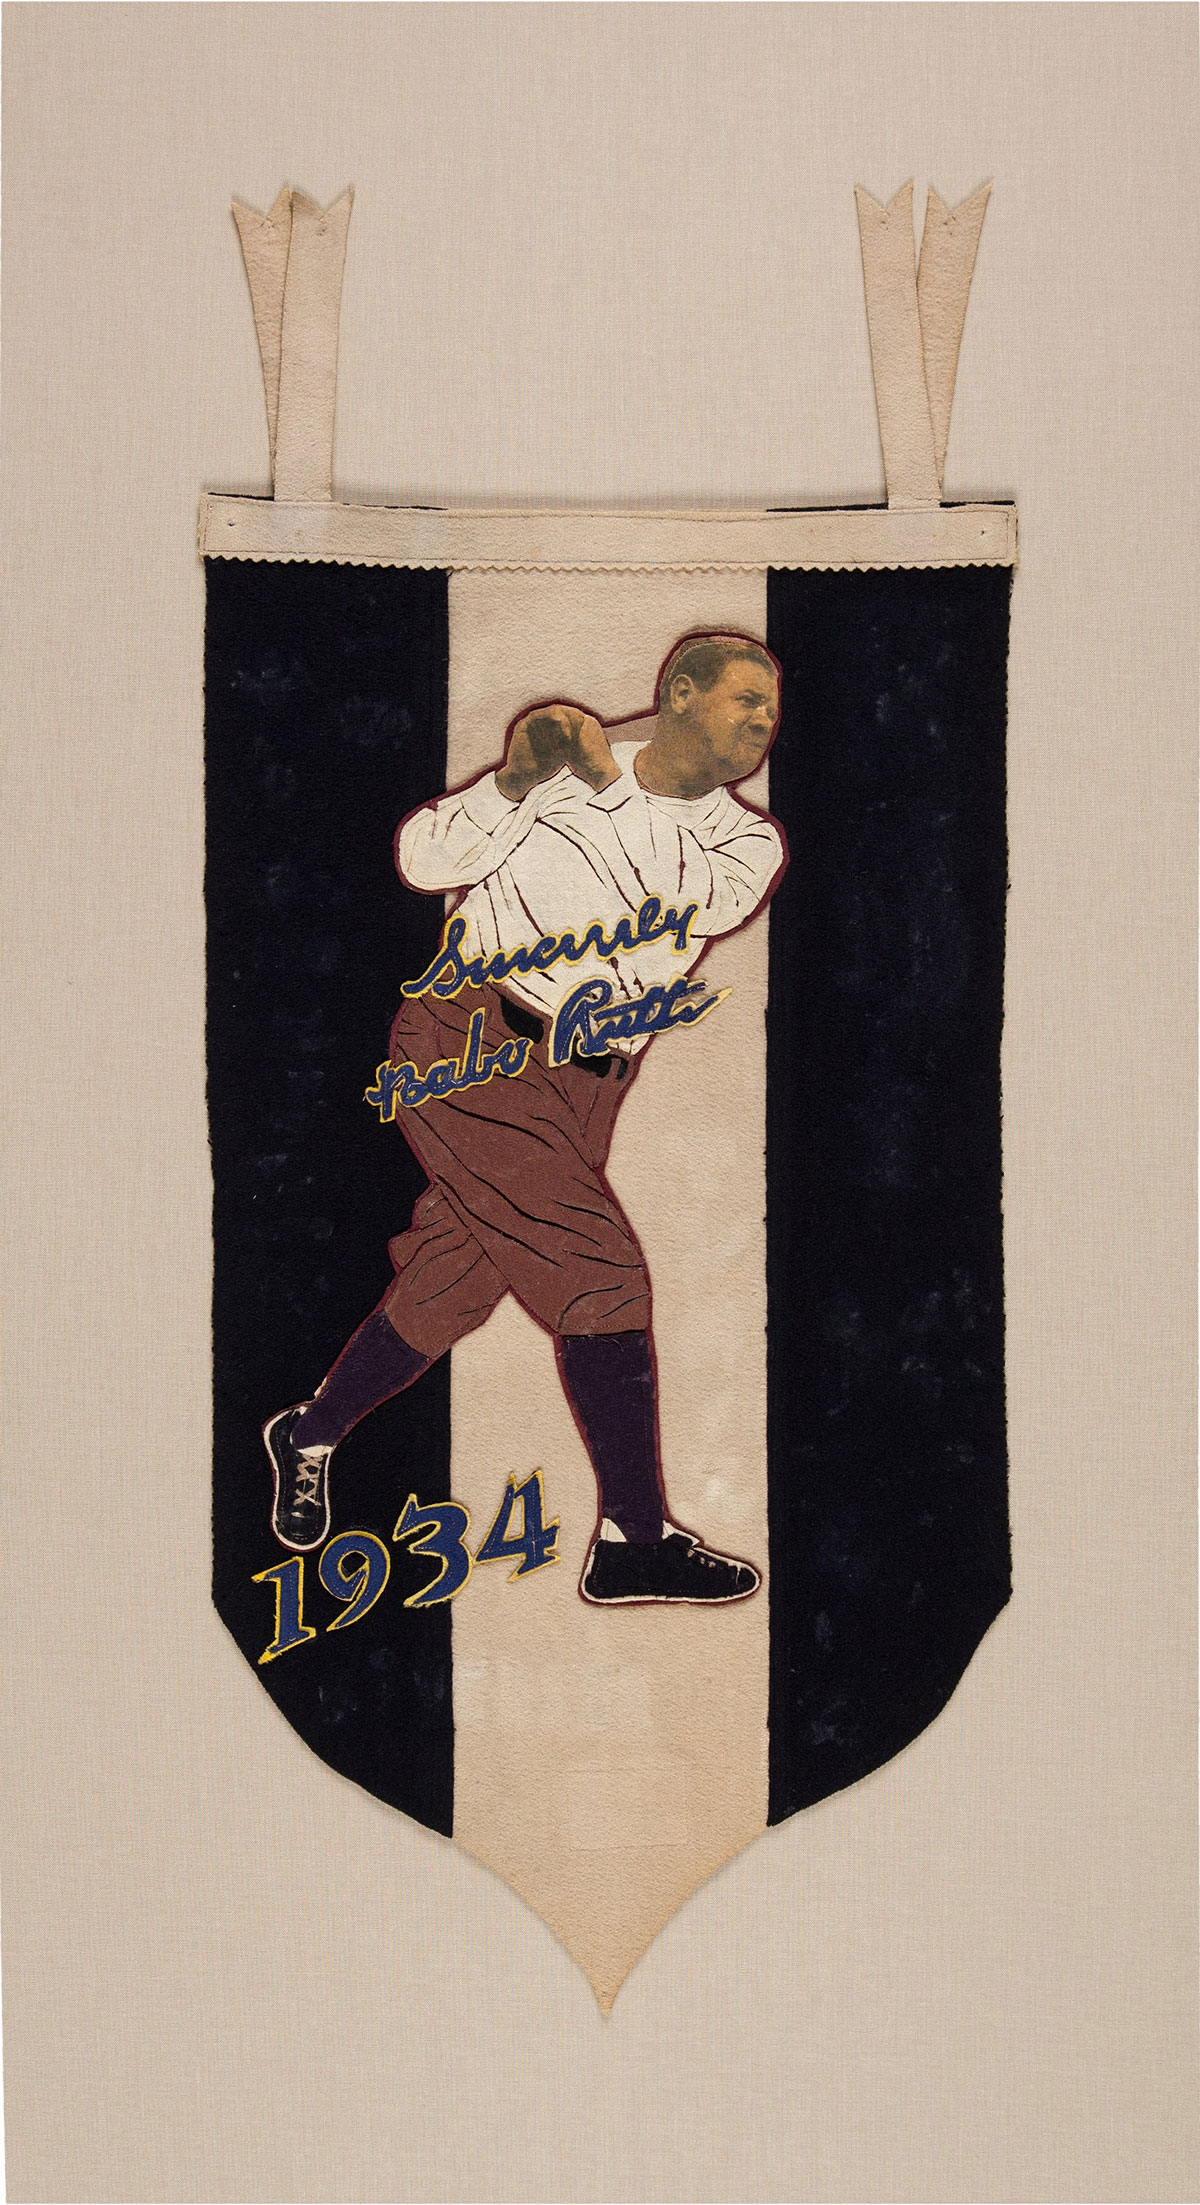 Heritage Baseball Auction